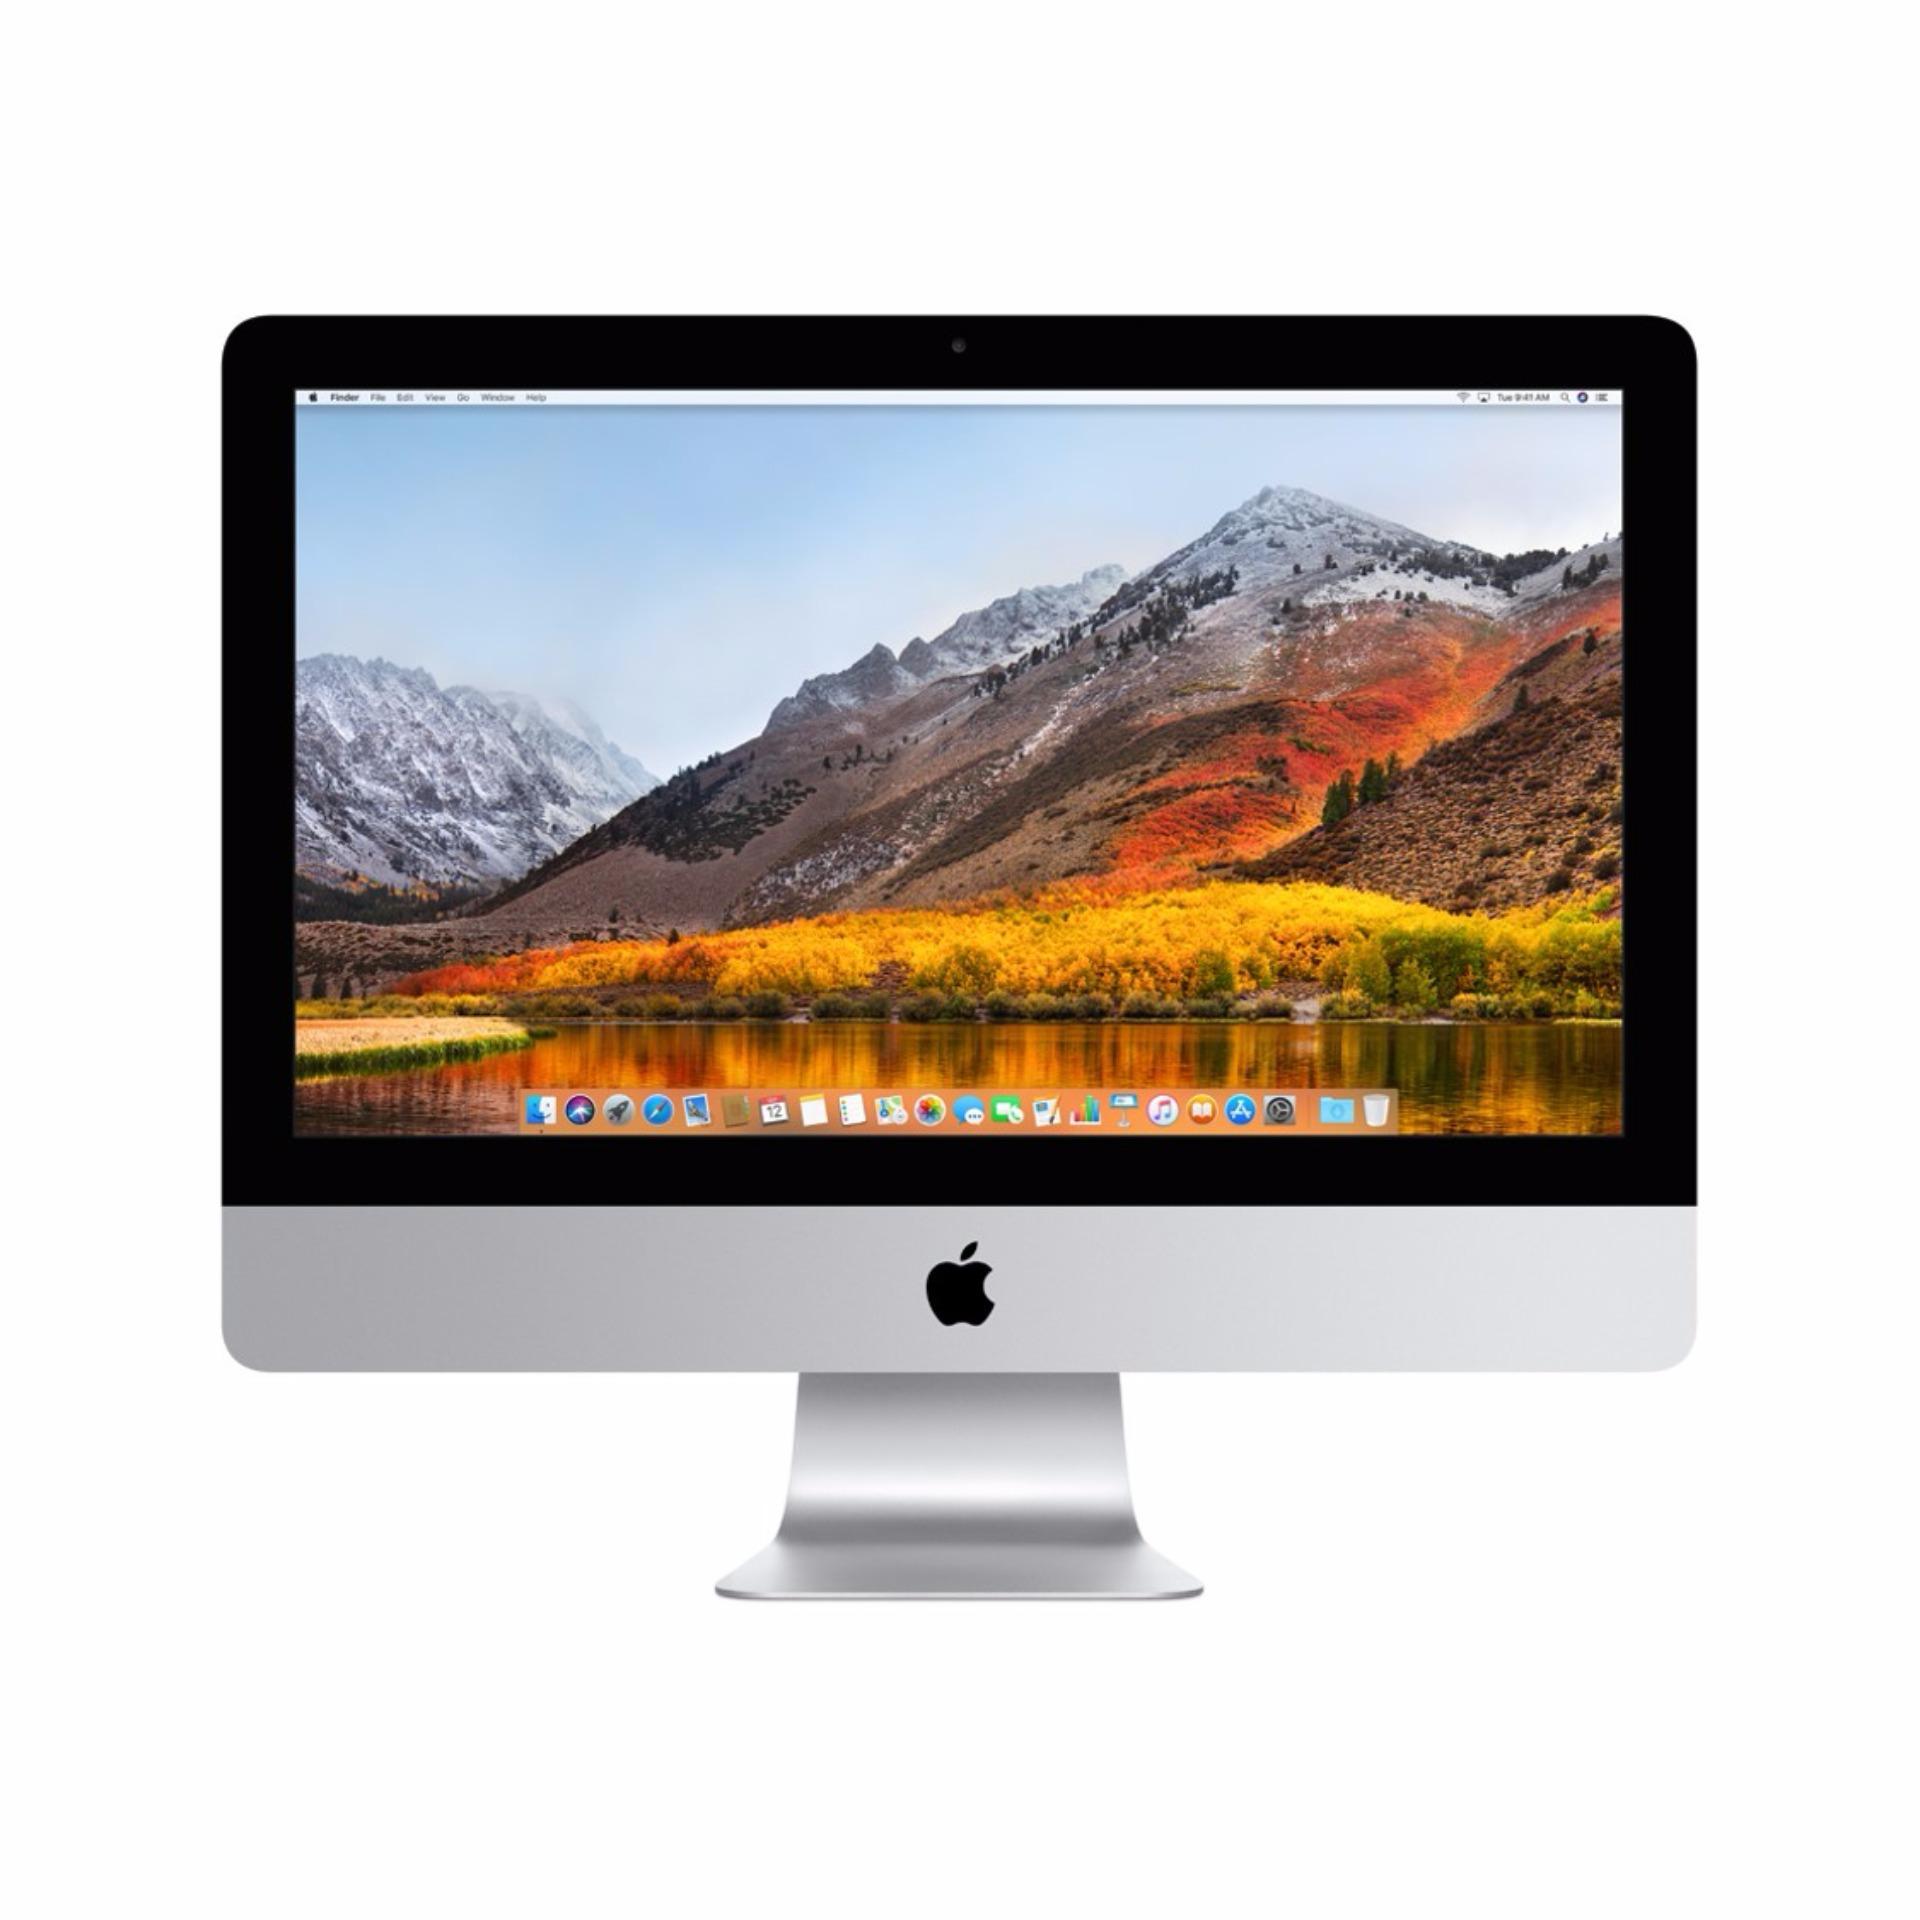 Apple iMac 21.5inch: 2.3GHz dual-core Intel Core i5